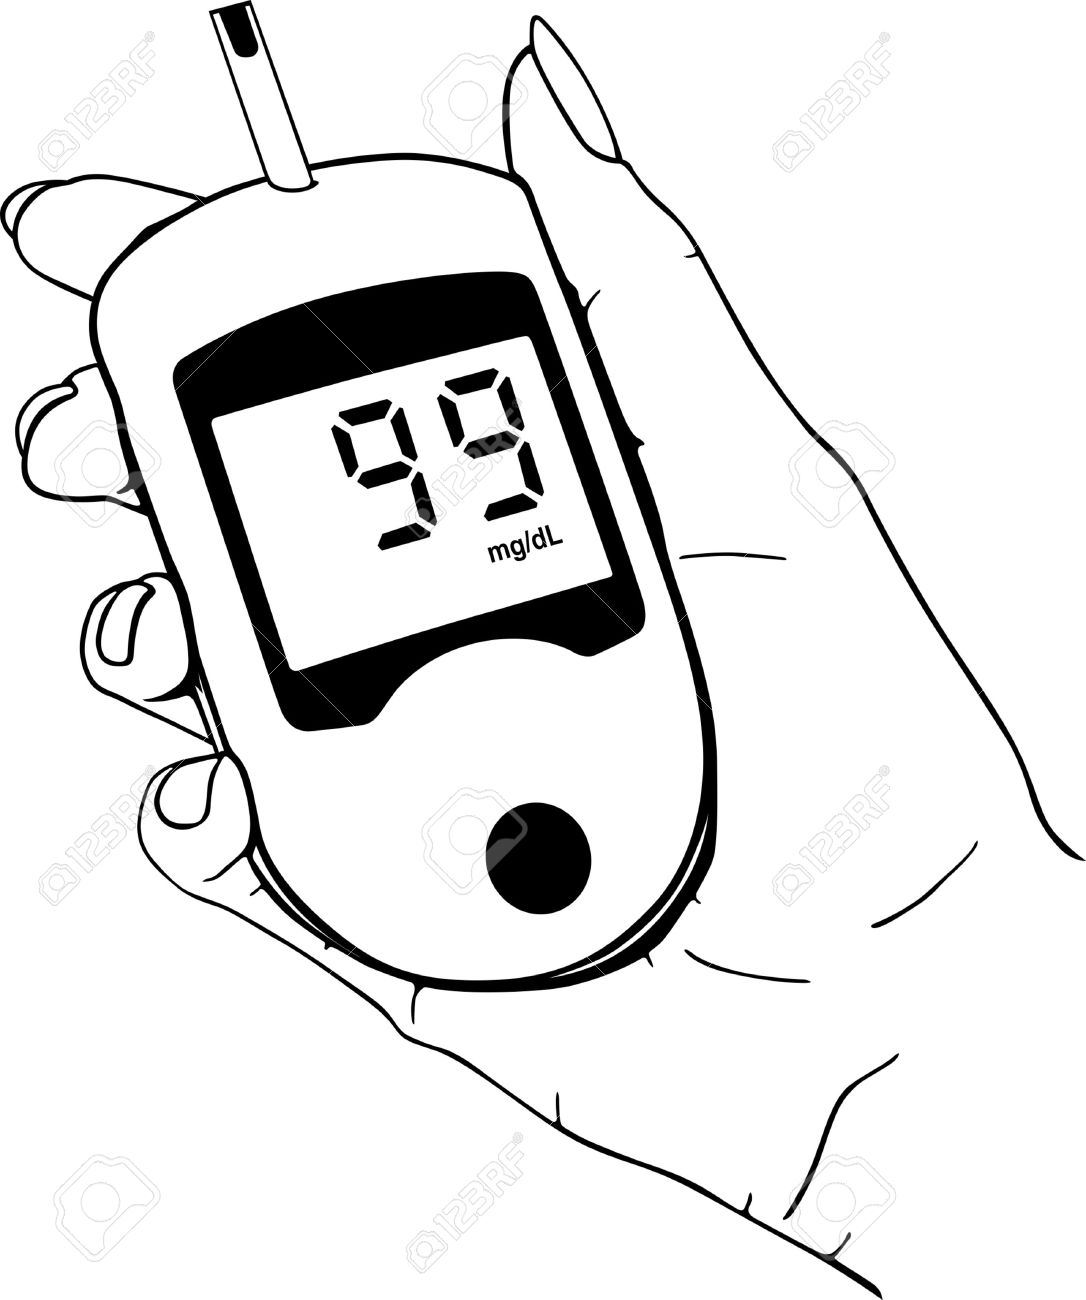 diabetes clip art free clipart panda free clipart images rh clipartpanda com diabetic clip art diabetic clip art